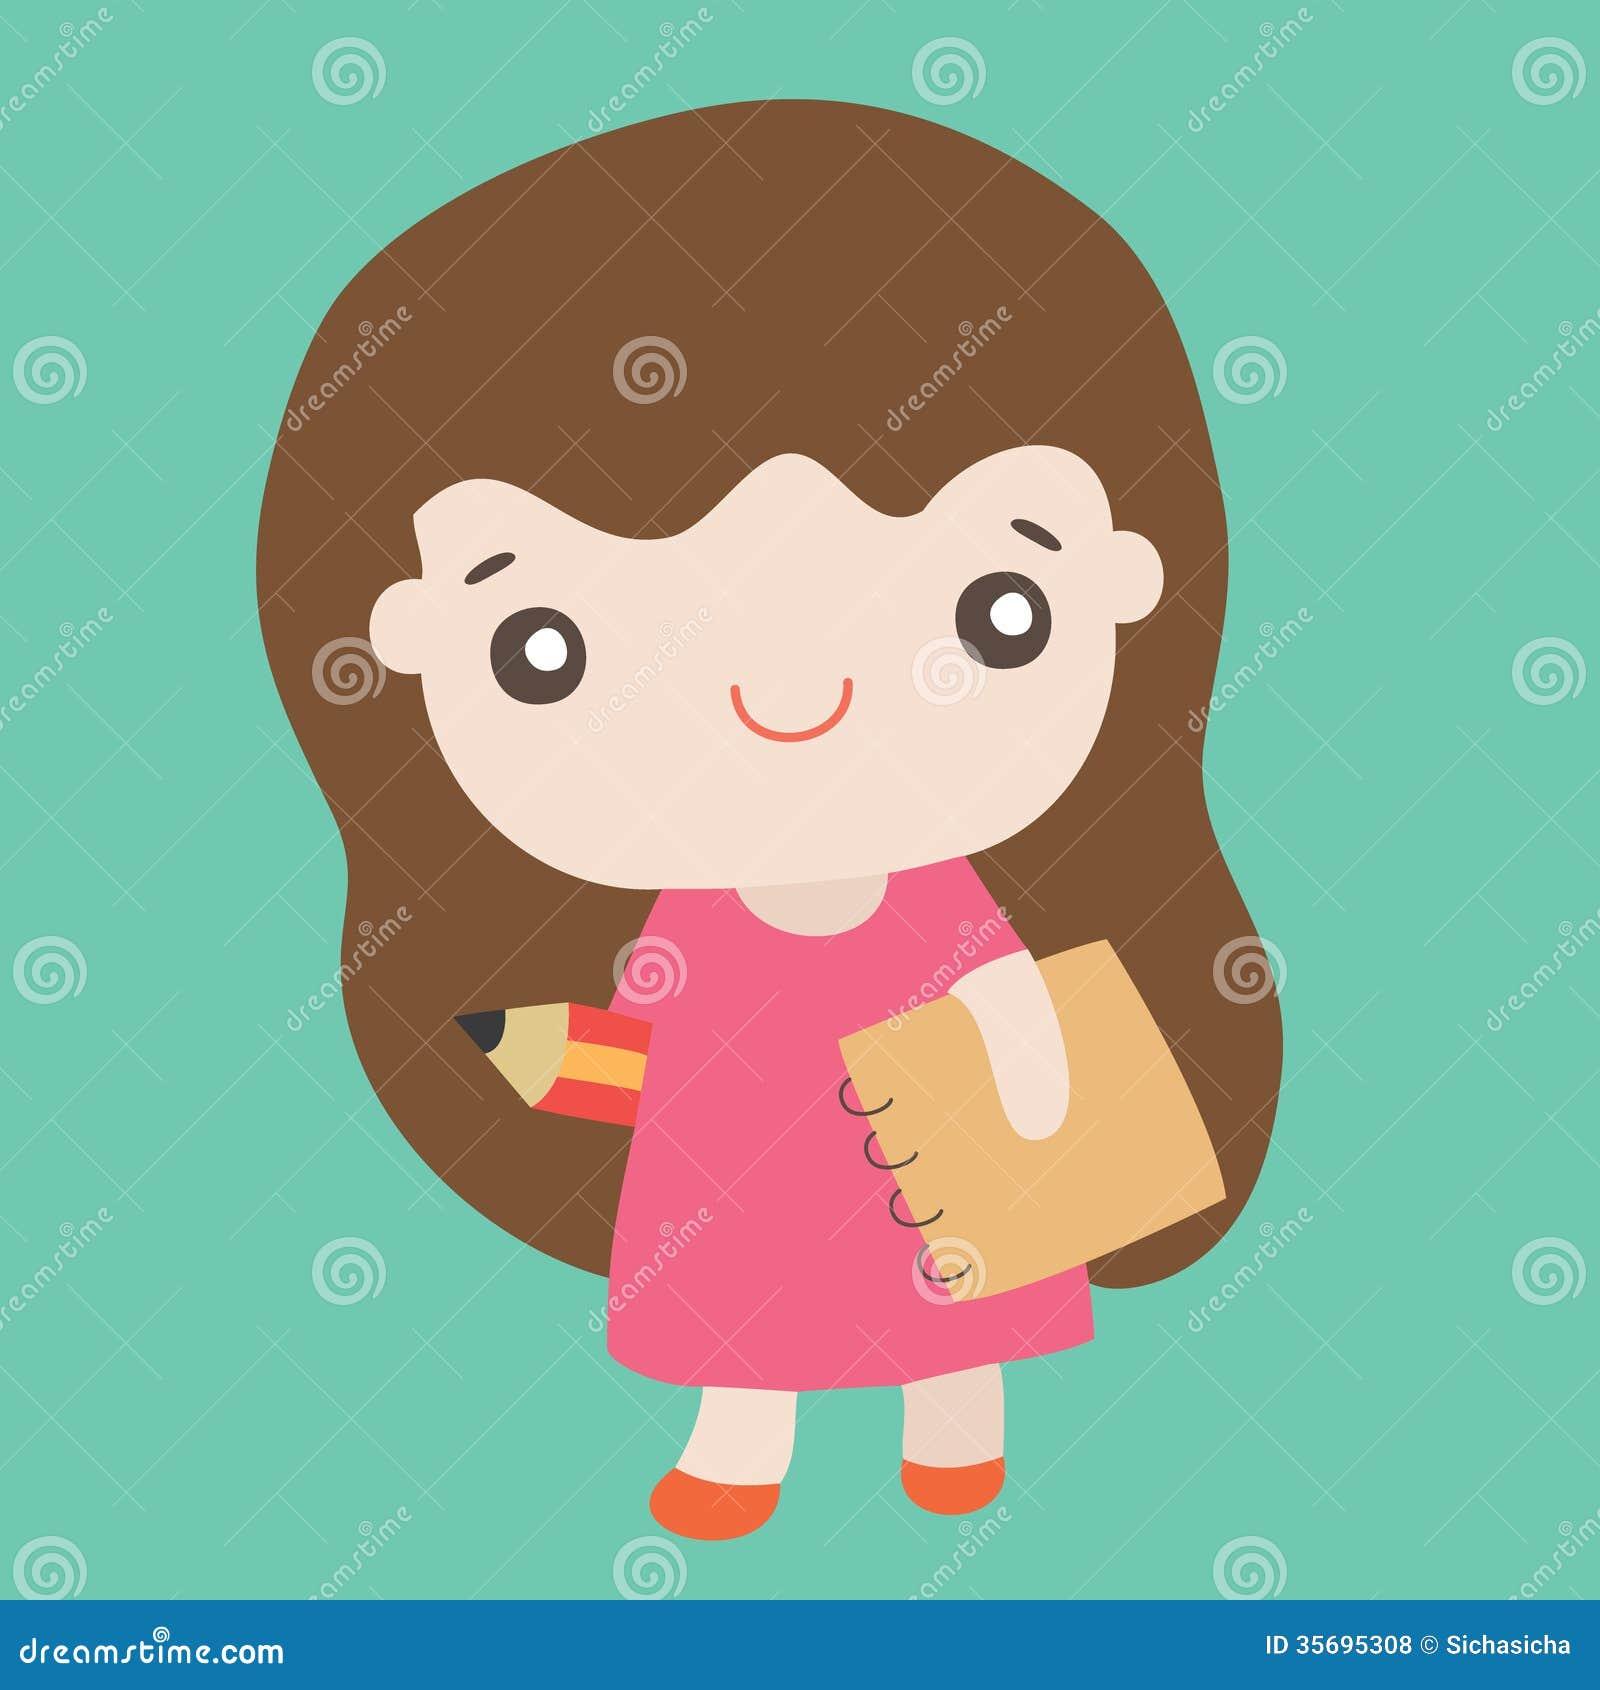 cartoon cute girl smiling stock vector. illustration of vector